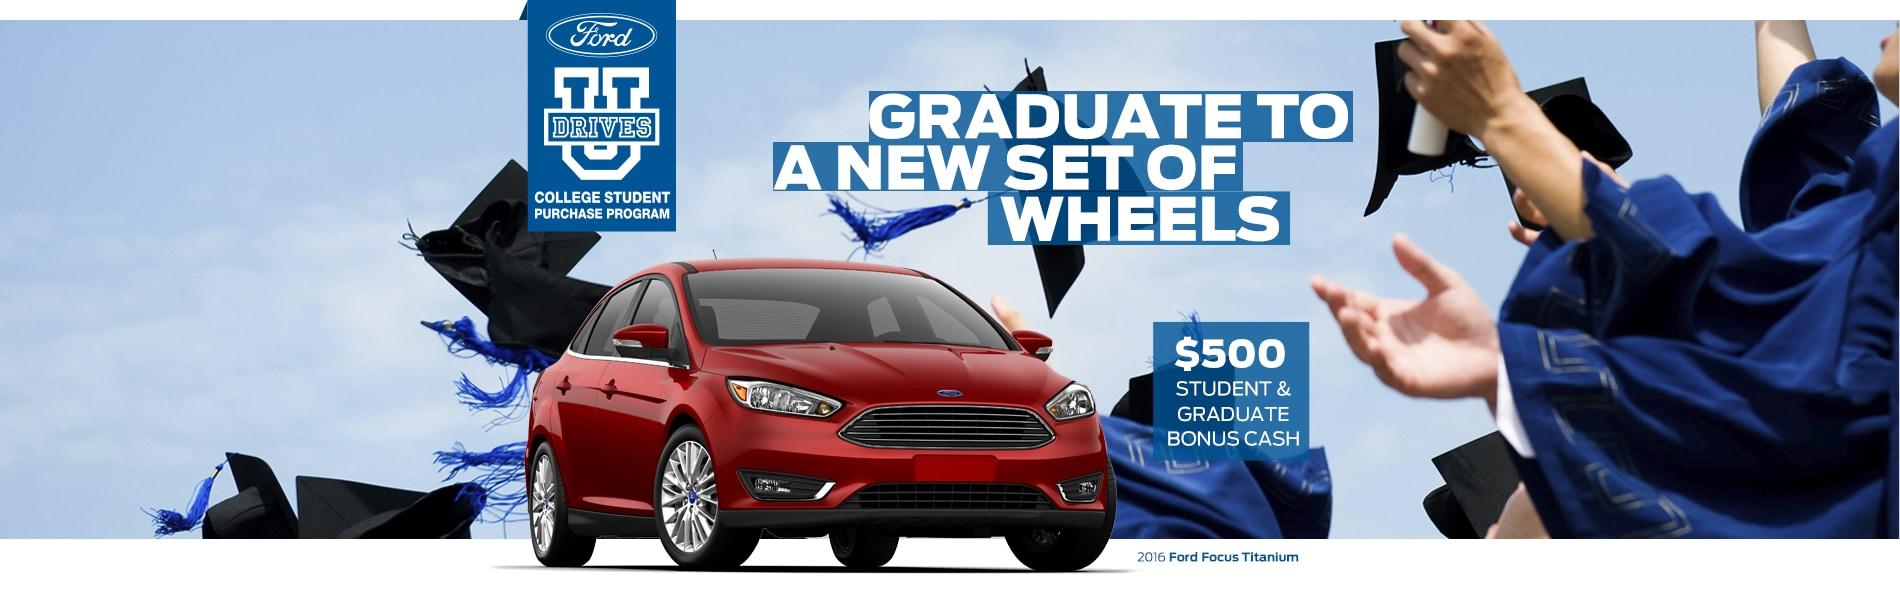 Ford College Graduate Program >> Ford College Student Purchase Program In Brandon Ms